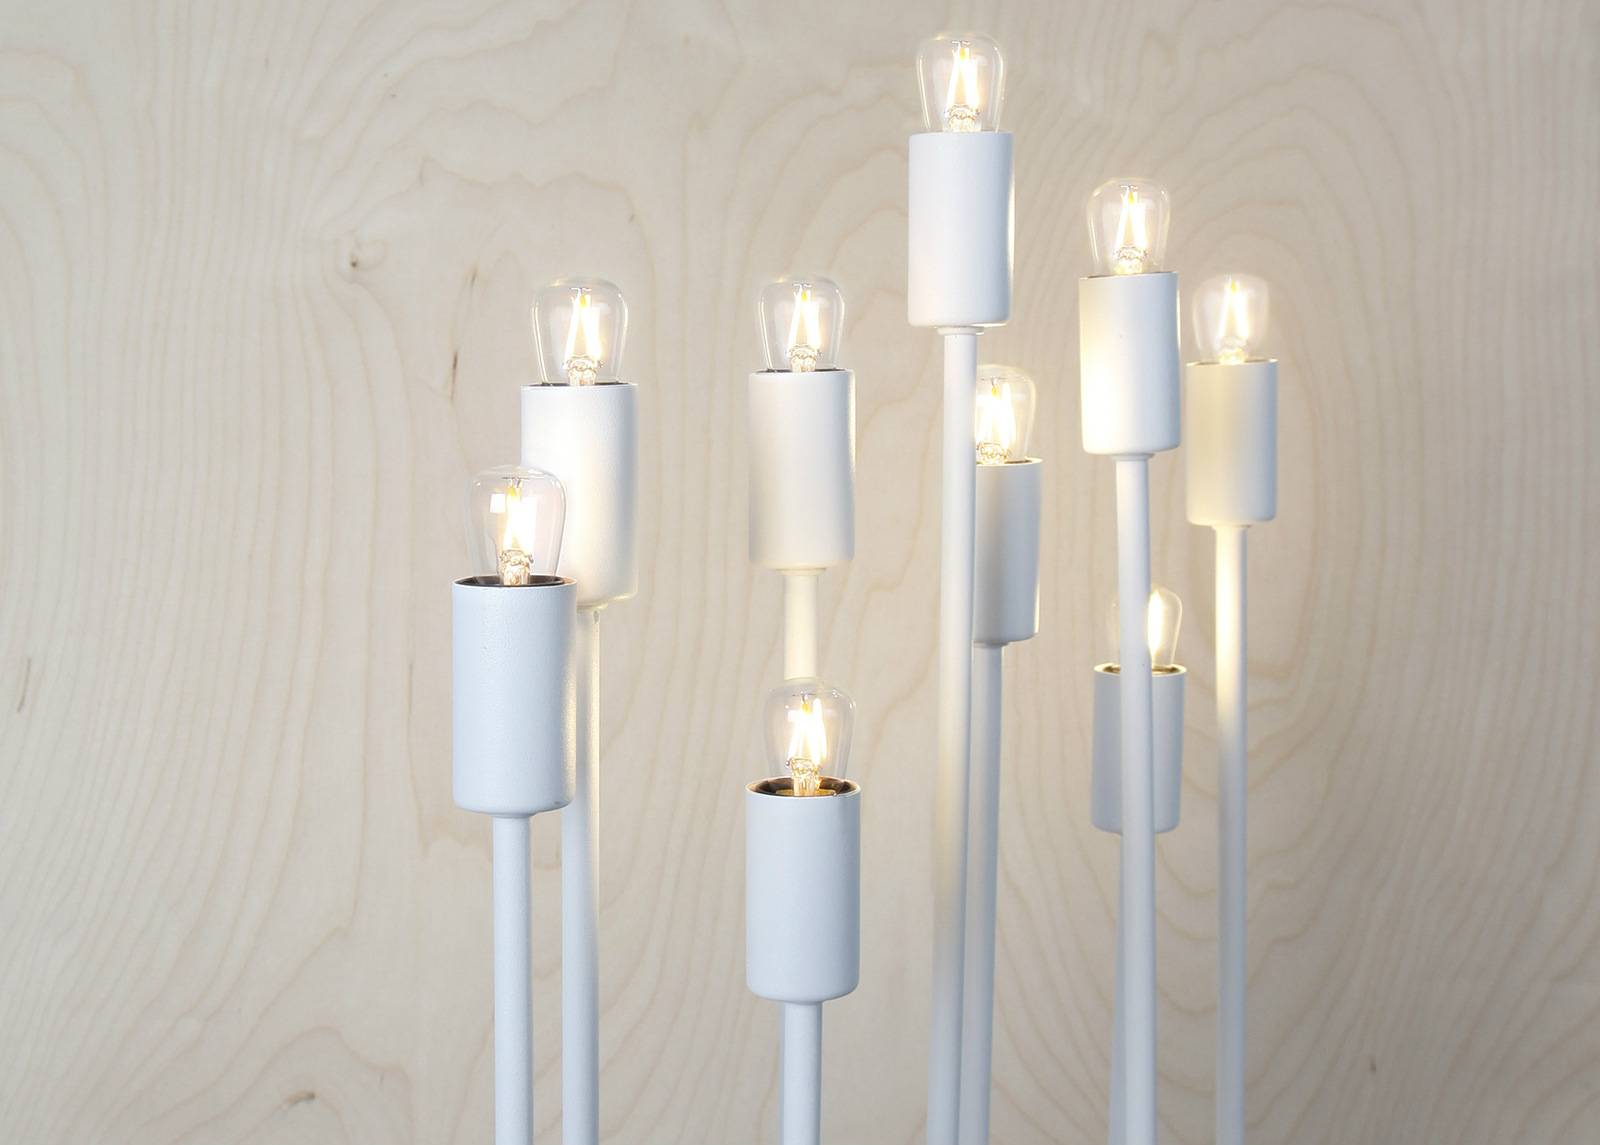 Star Trading LED lamput 2 kpl